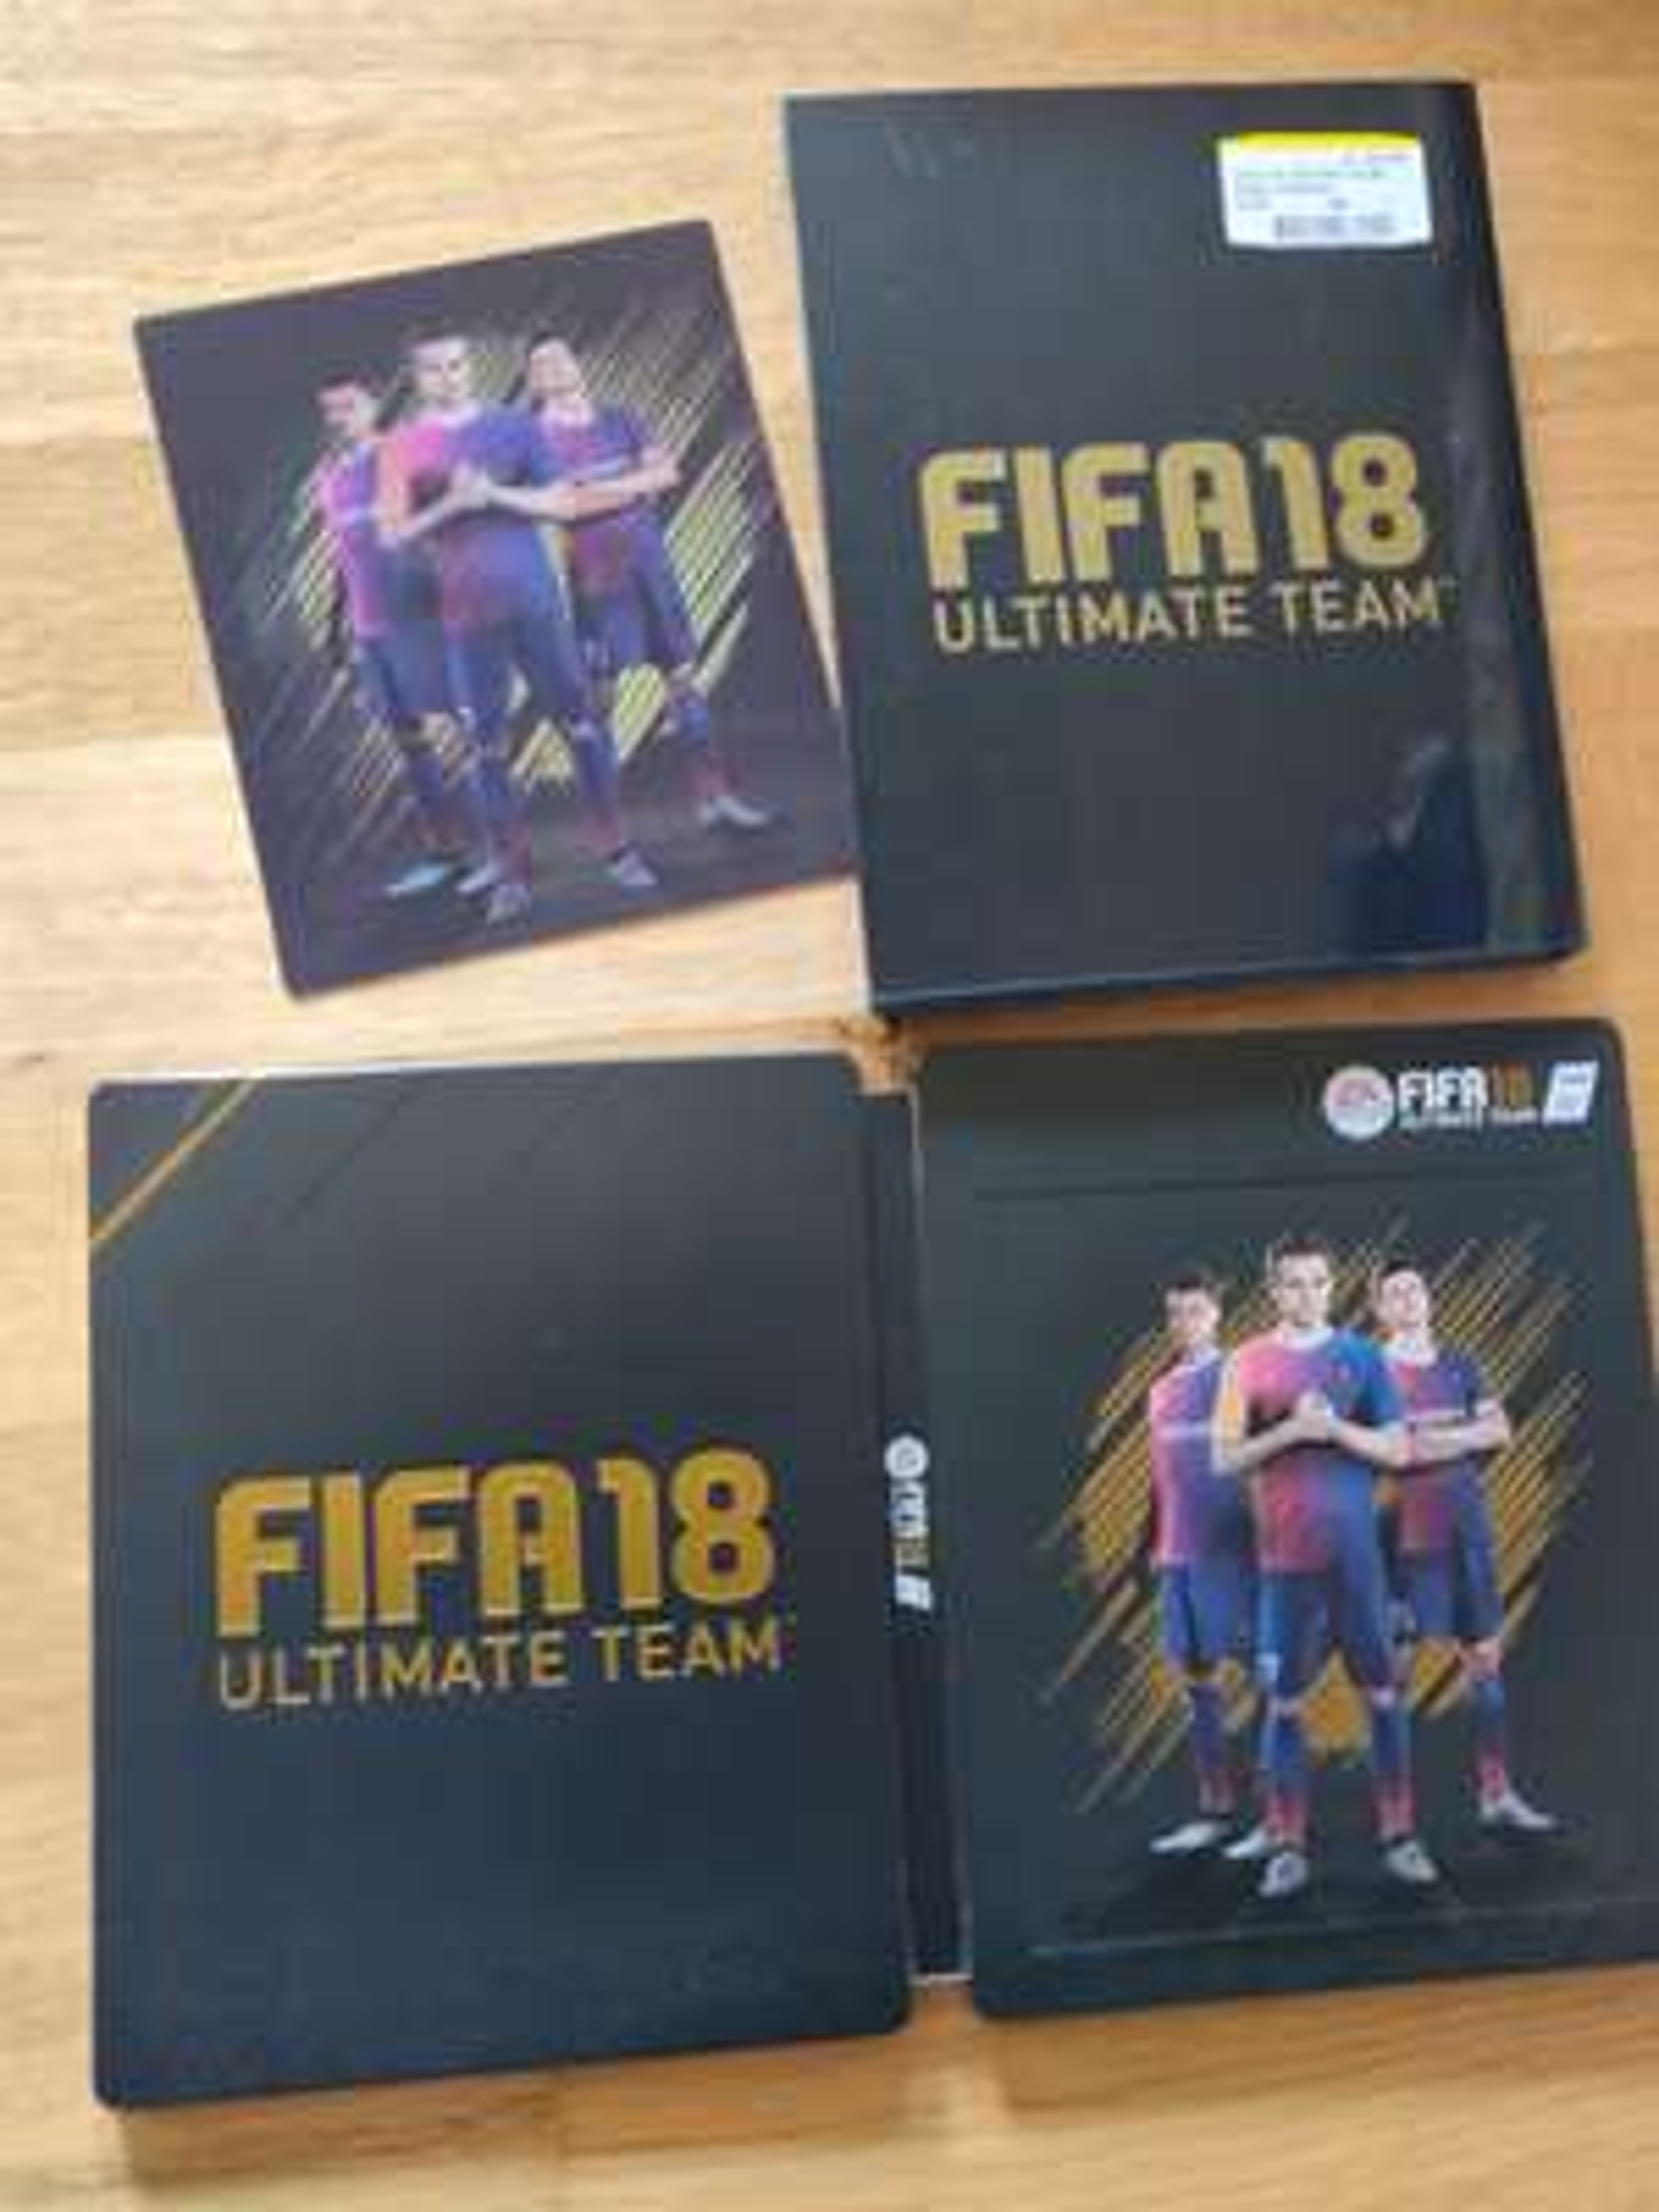 [Lokal, Media Markt Landau/Pfalz] FIFA 18 3D Lenticular Steelbook (ohne Spiel)